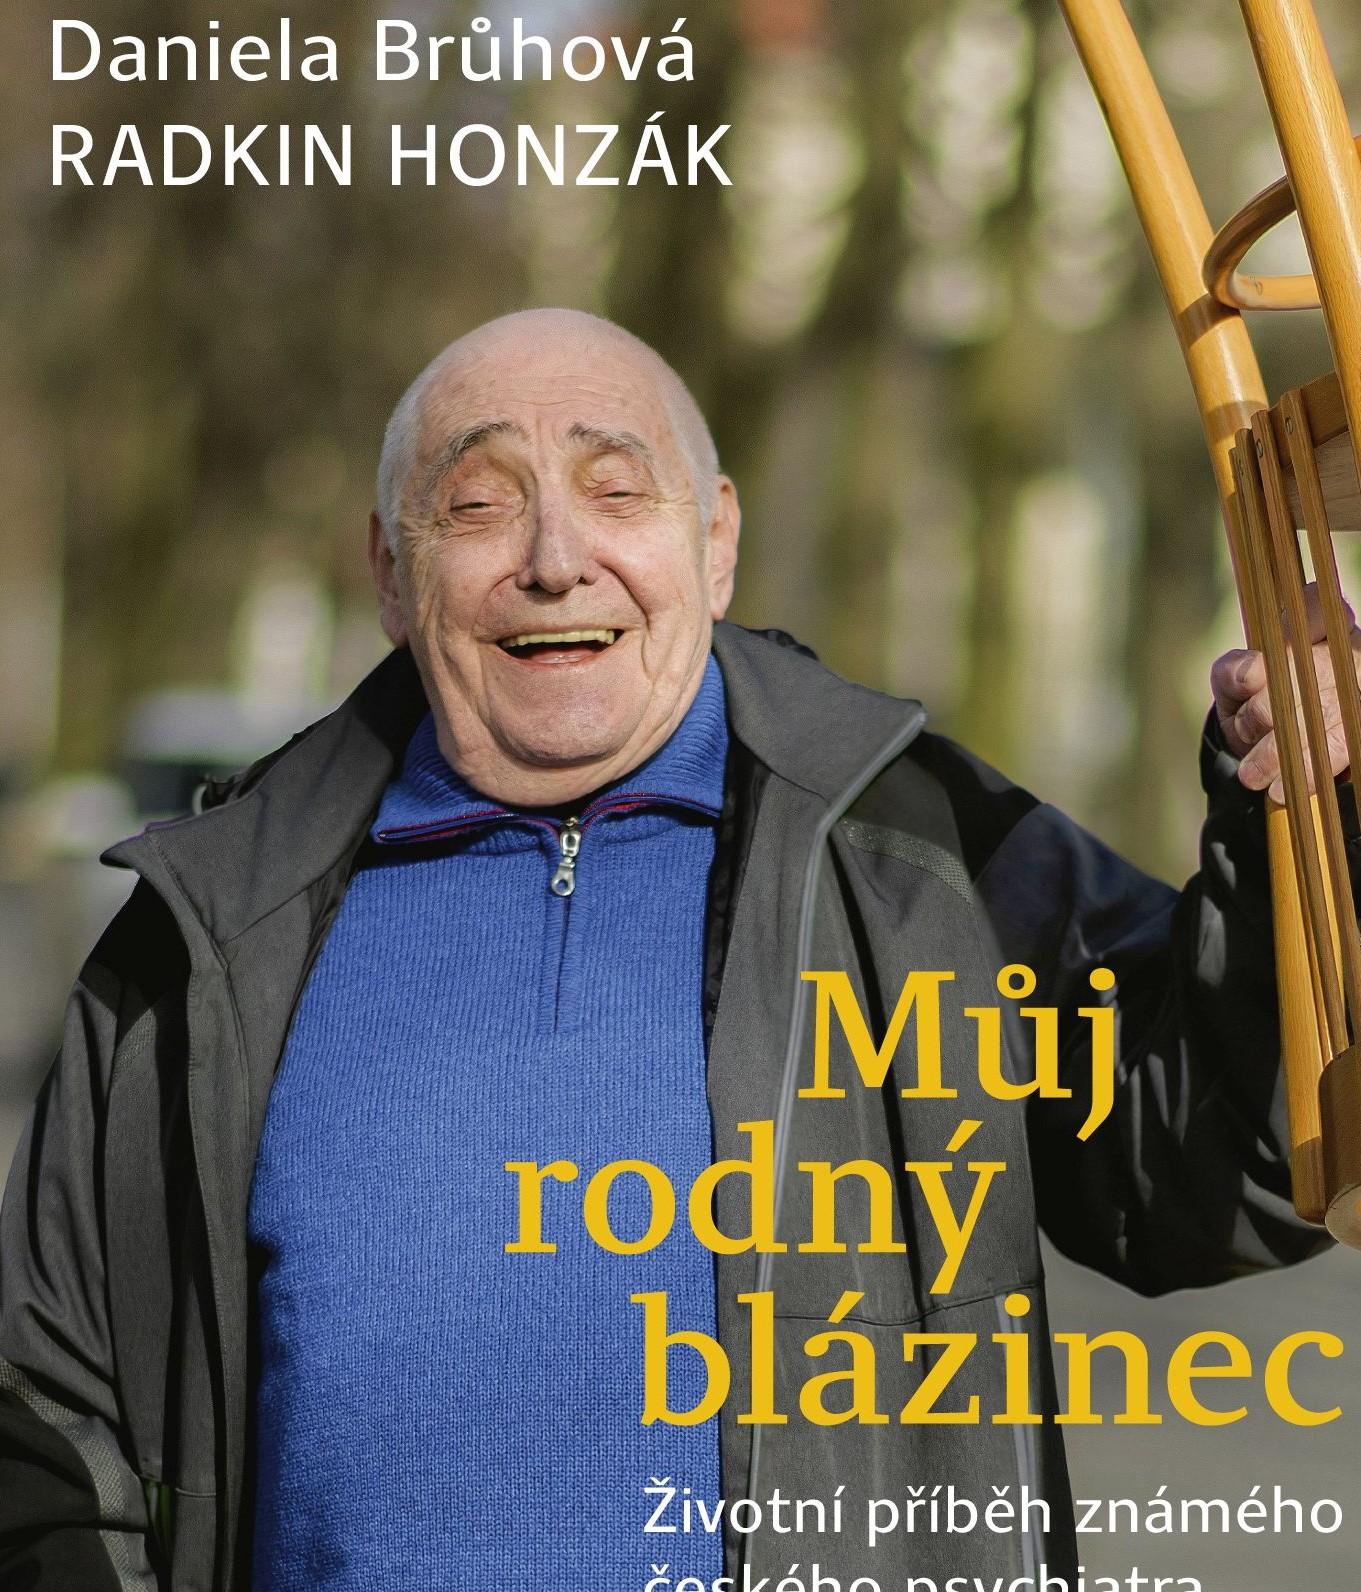 Radkin Honzák